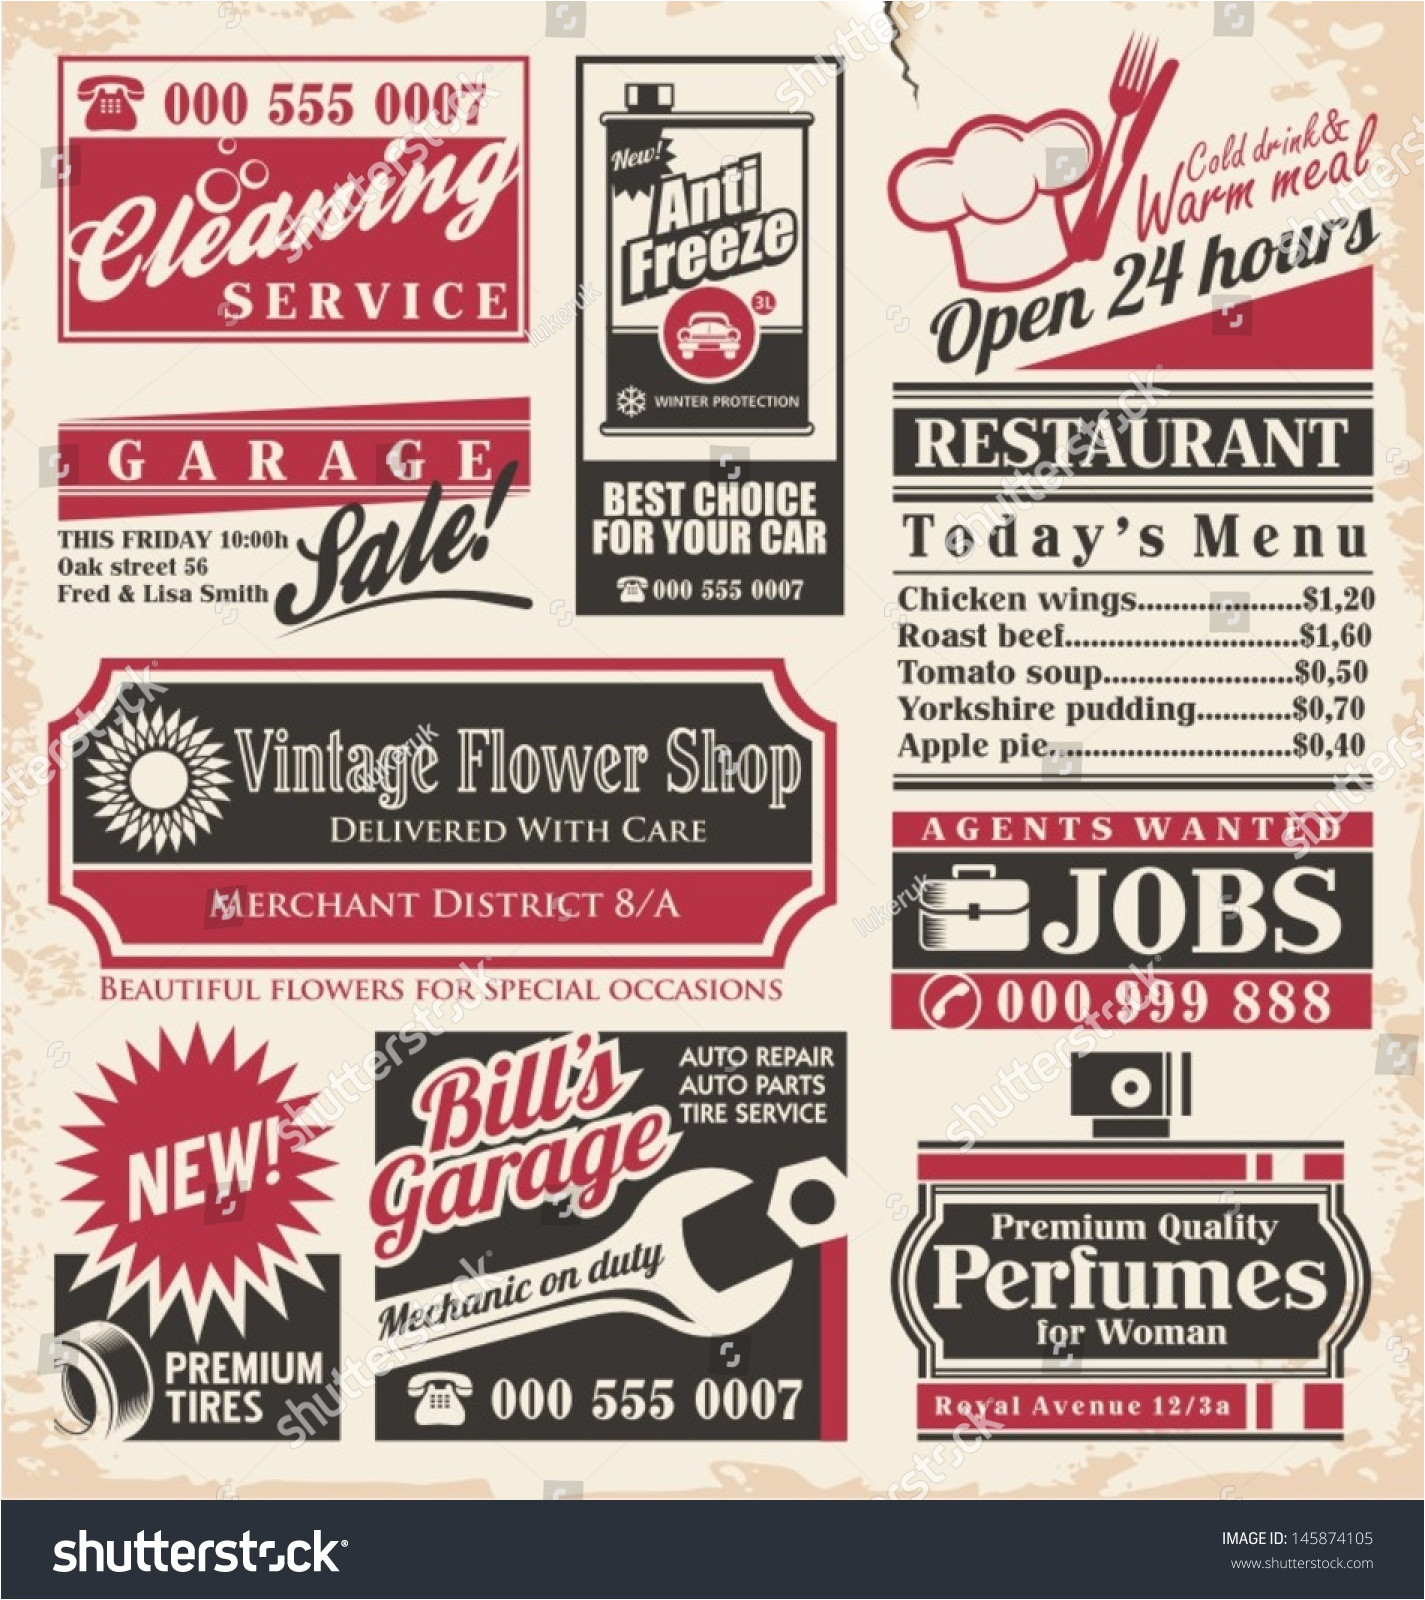 retro newspaper ads design template vector 145874105